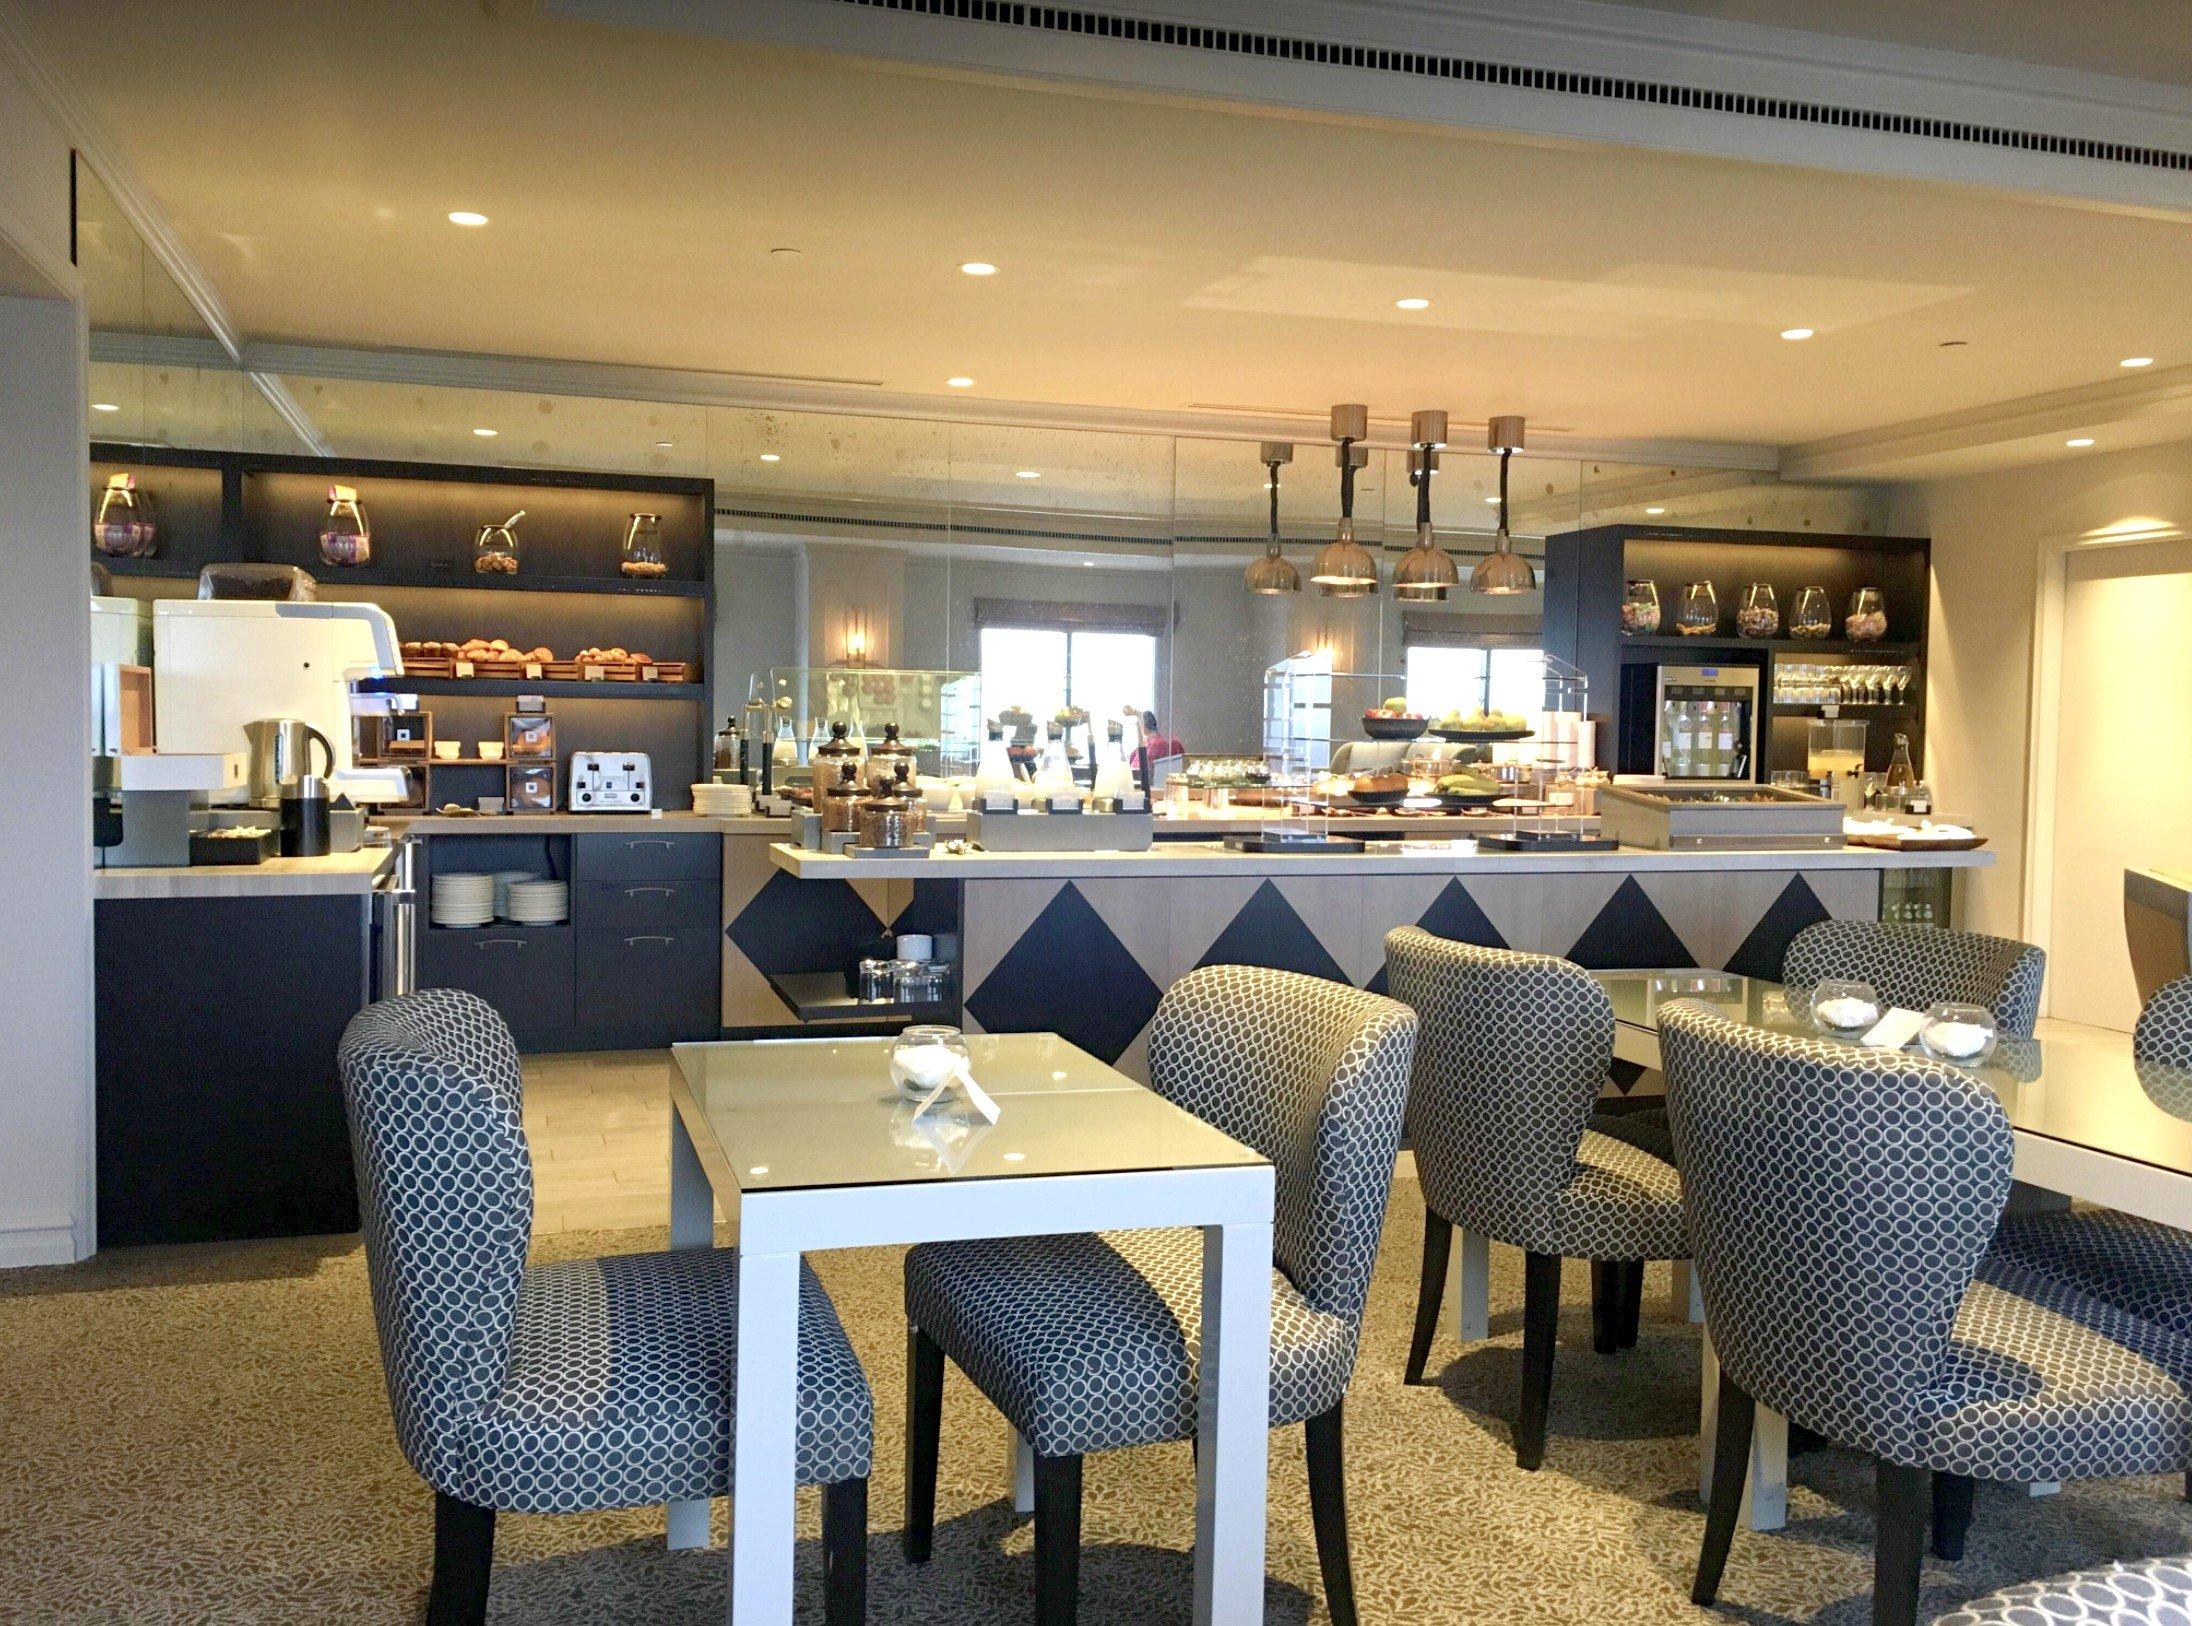 The 18th Floor Club Lounge at The Ritz-Carlton Pentagon City